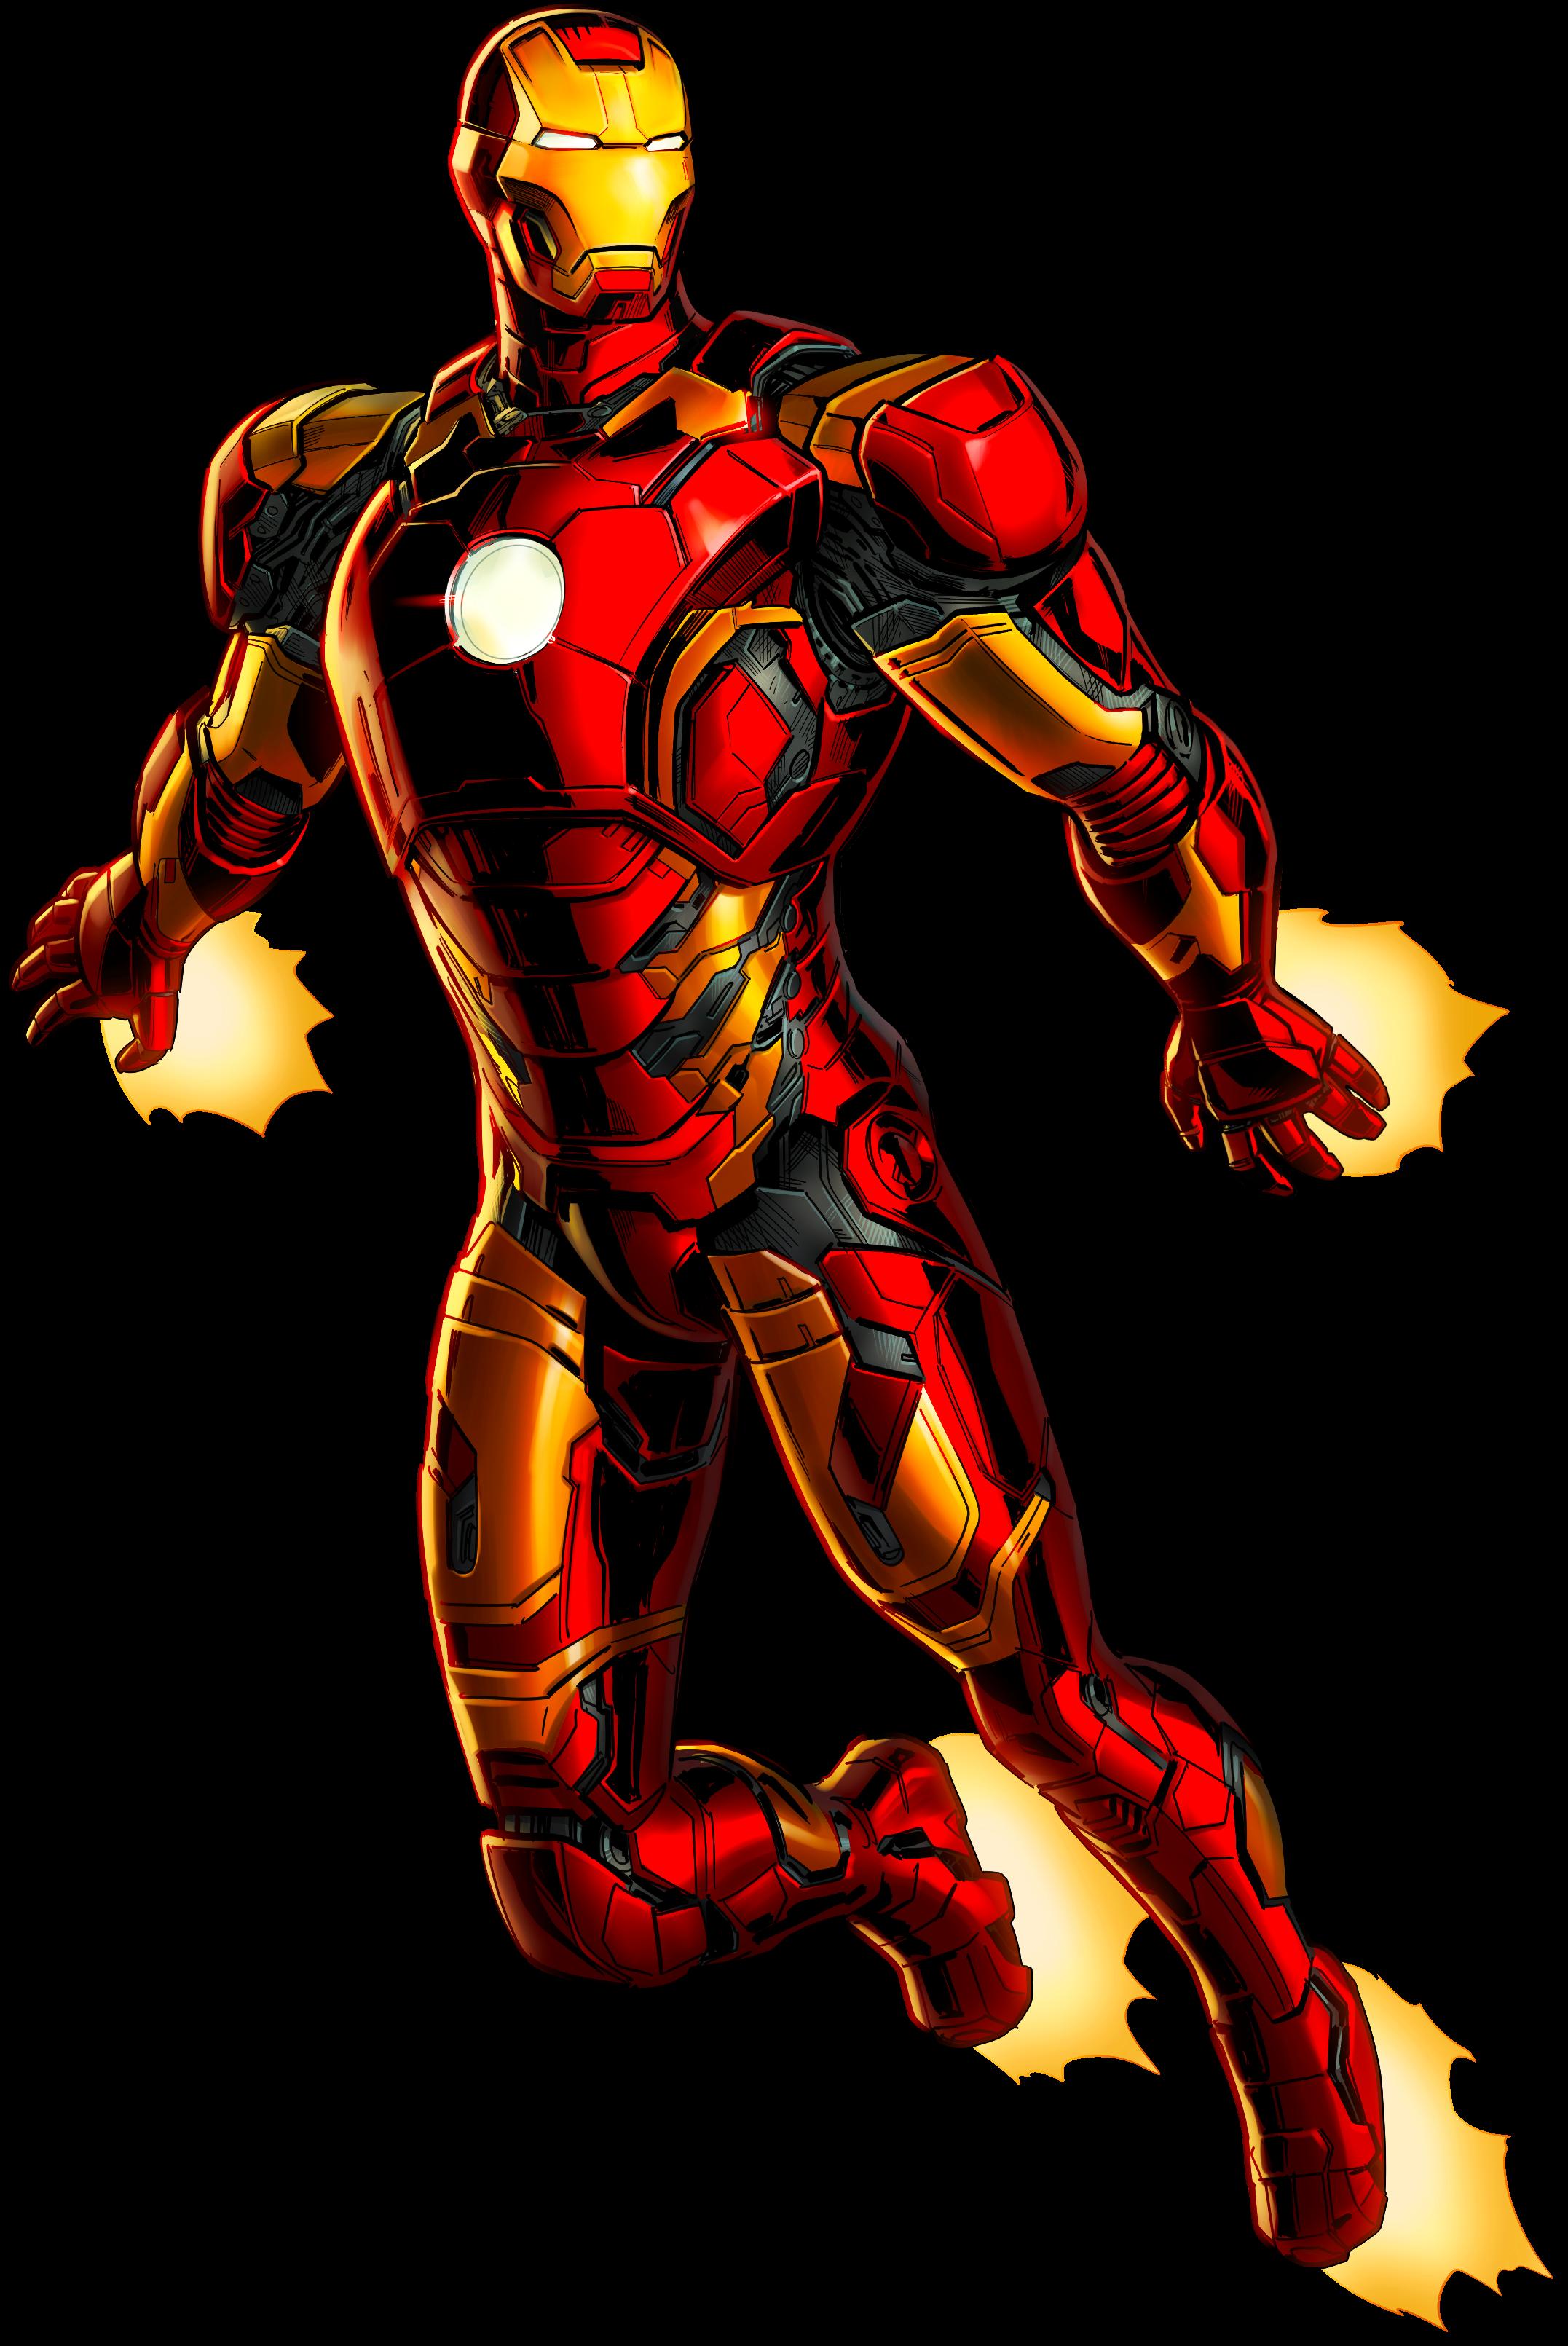 Iron Man AoU by AlexelZ on DeviantArt